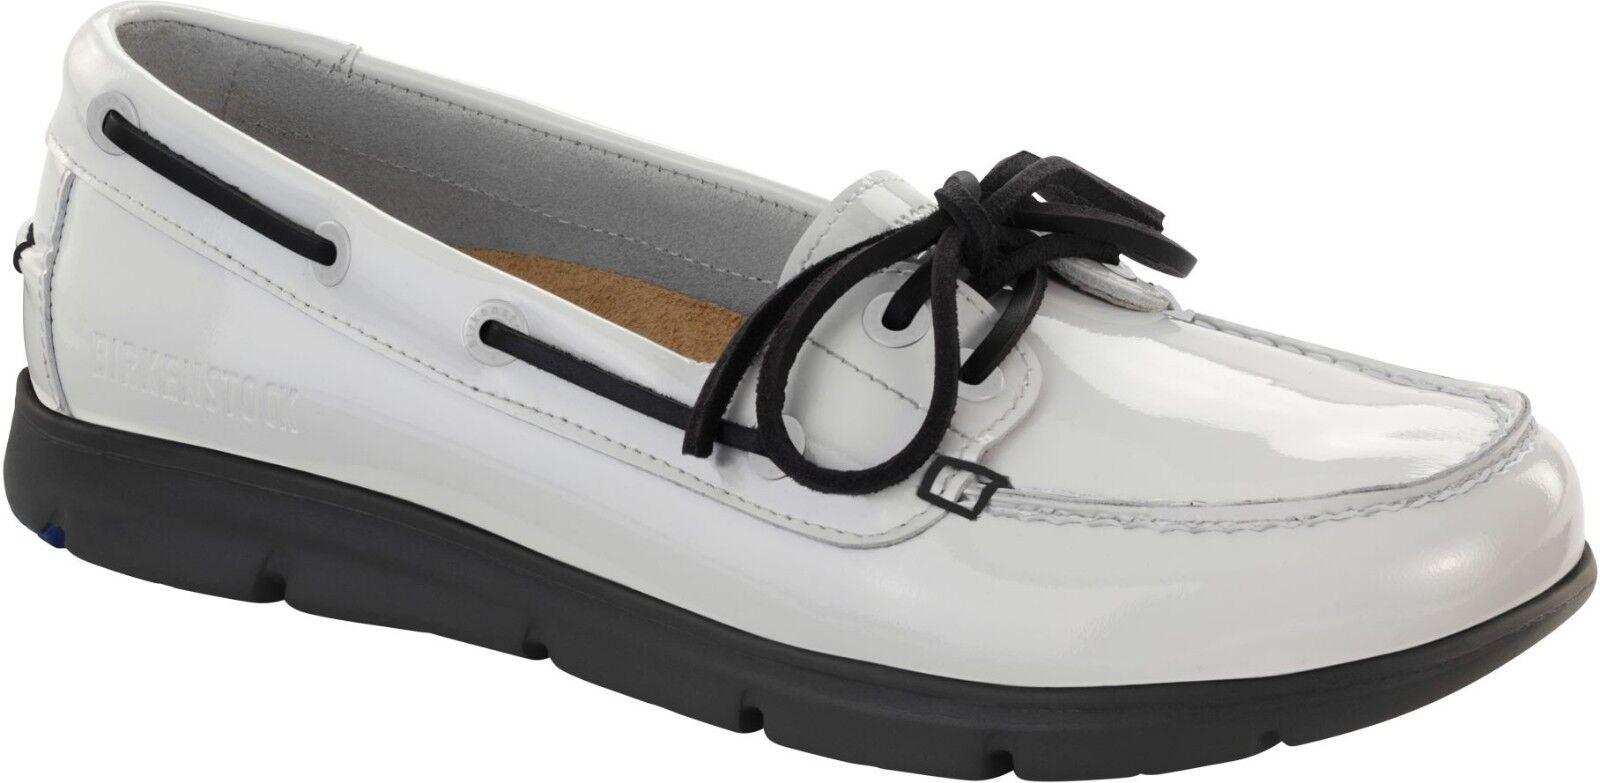 Birkenstock Tennessee Weiß Lack Leder - Größe 38 Fußbett schmal - Leder 3b55ca